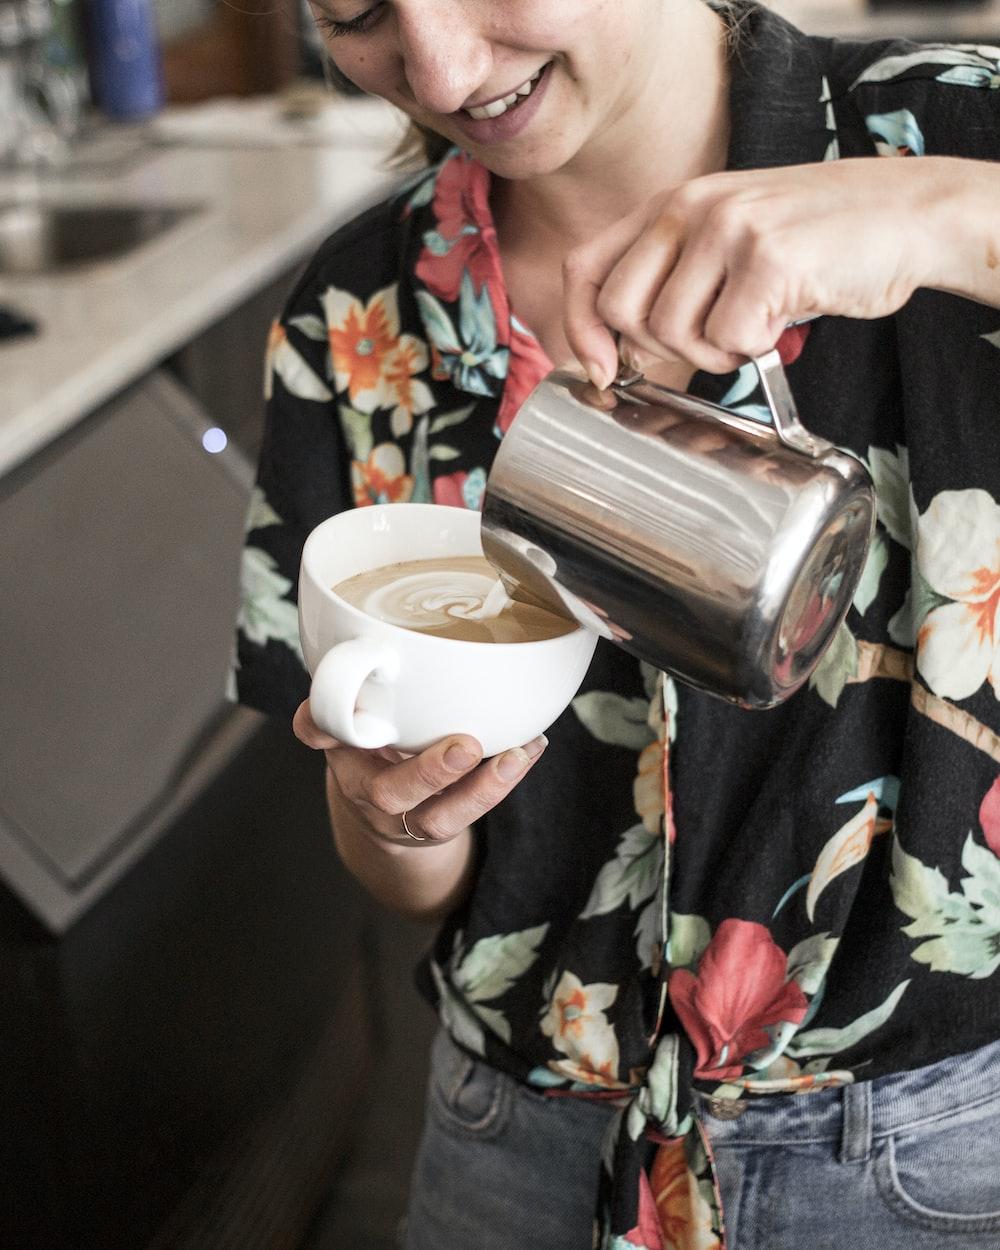 woman pouring coffee on white mug